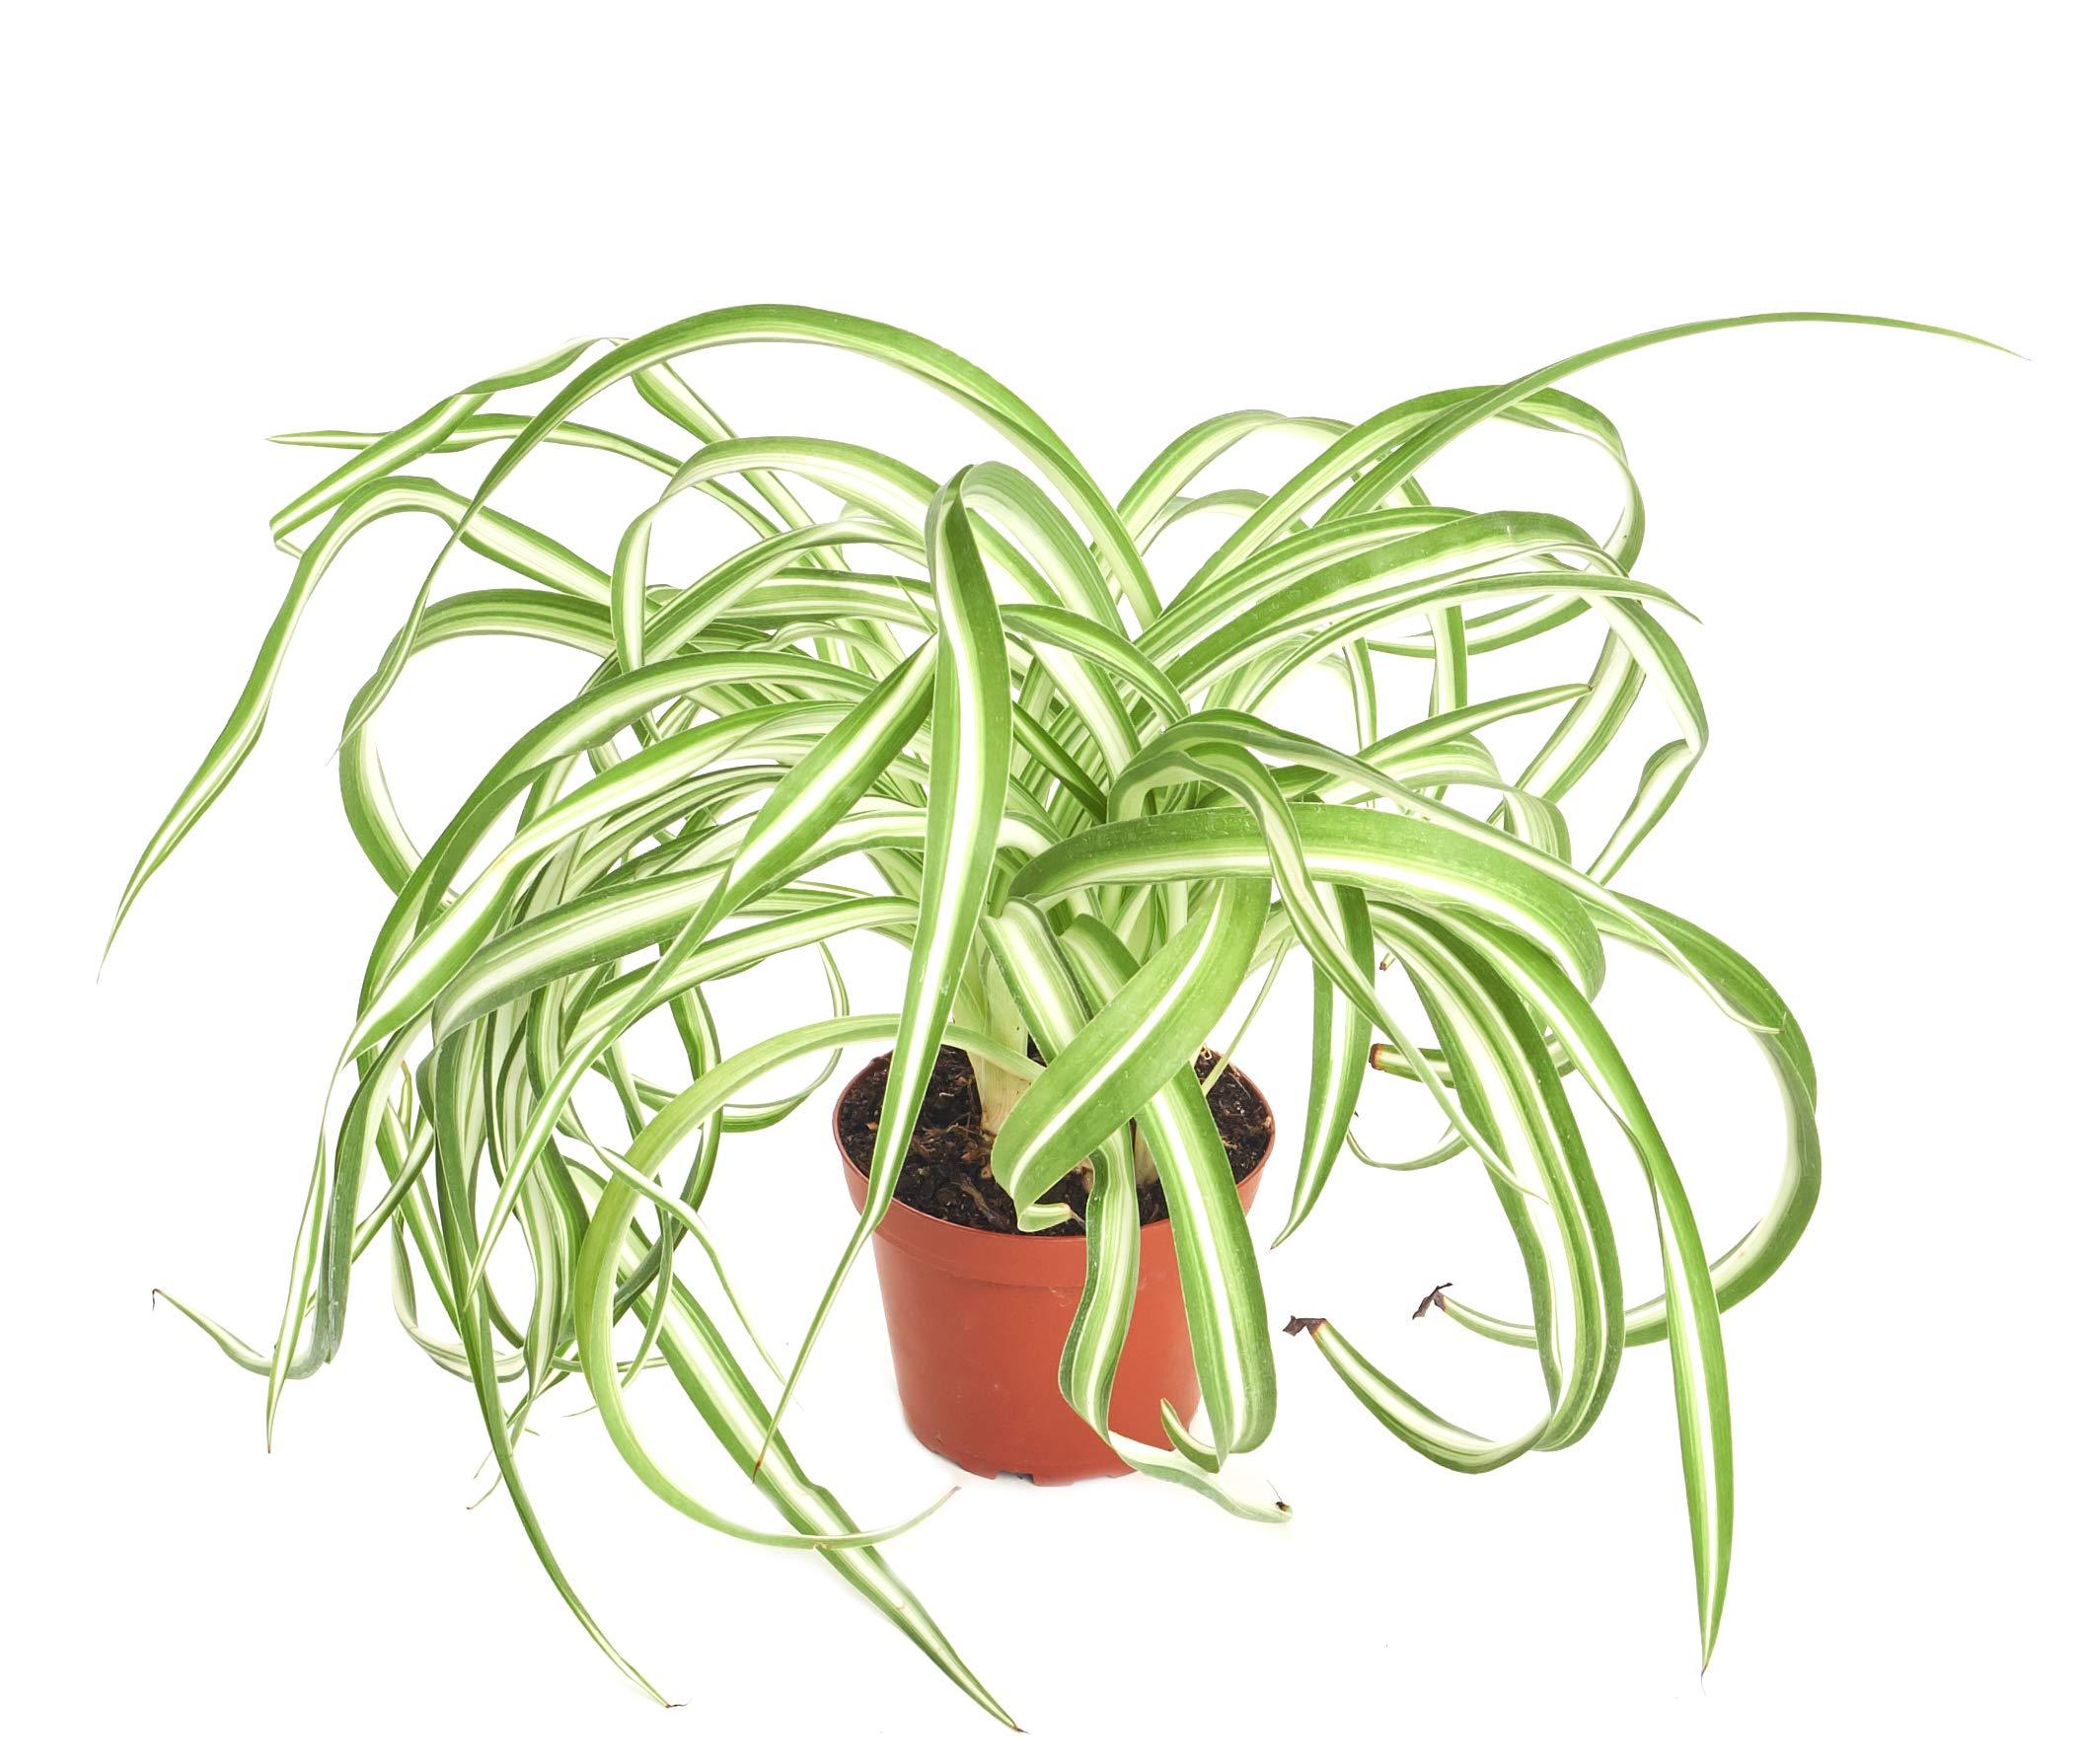 Shop Succulents 4'' Chlorophytum Bonnie Easy Care, Live Indoor House Plant, 4'' Grower Pot, Curly Spider by Shop Succulents